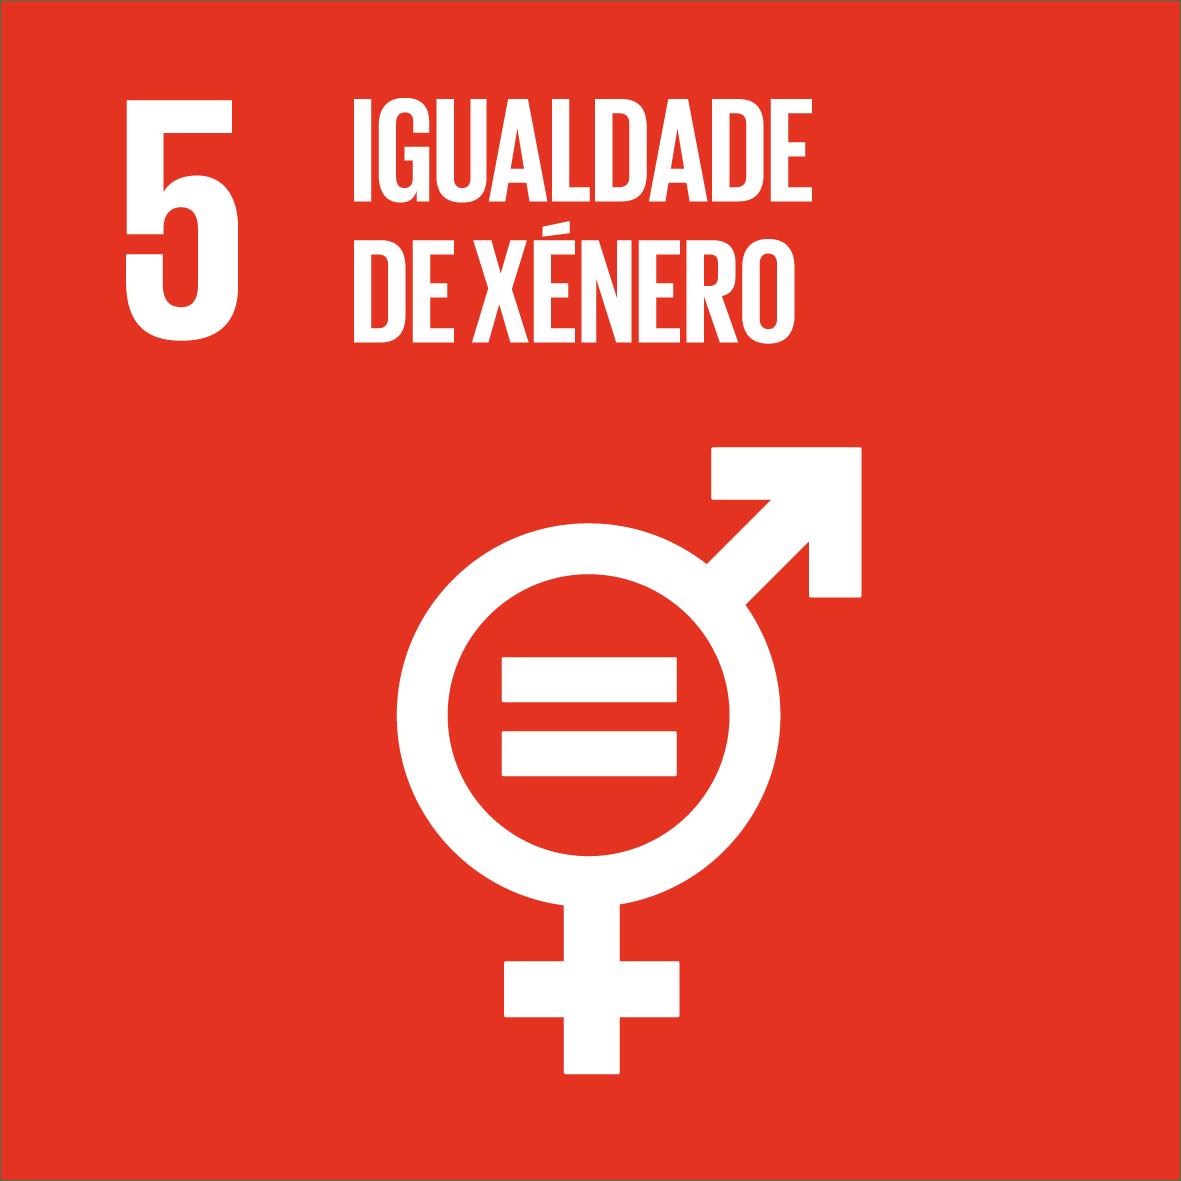 ODS 5: Igualdade de xénero